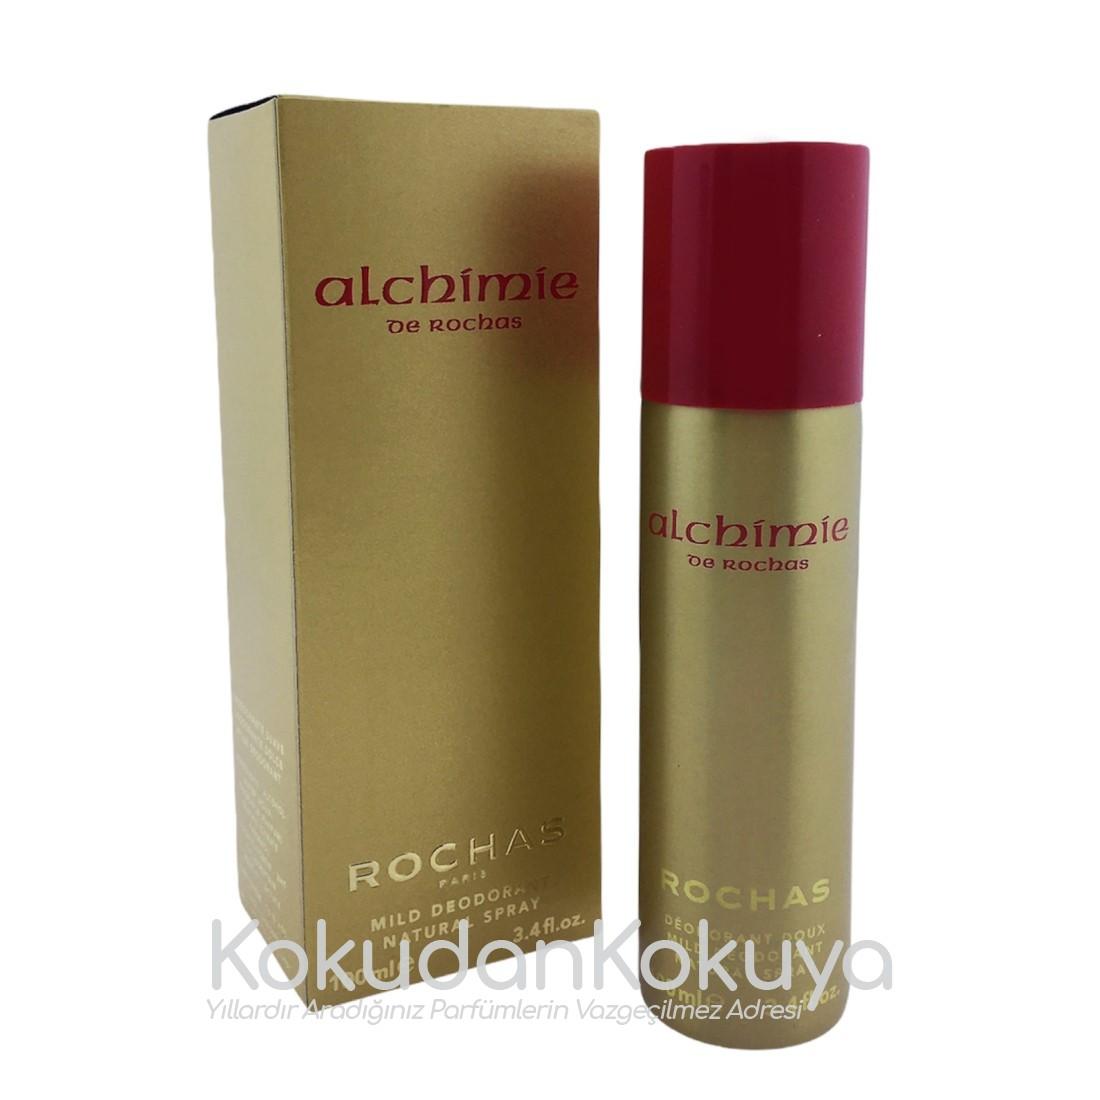 ROCHAS Alchimie (Vintage) Deodorant Kadın 100ml Deodorant Spray (Metal)